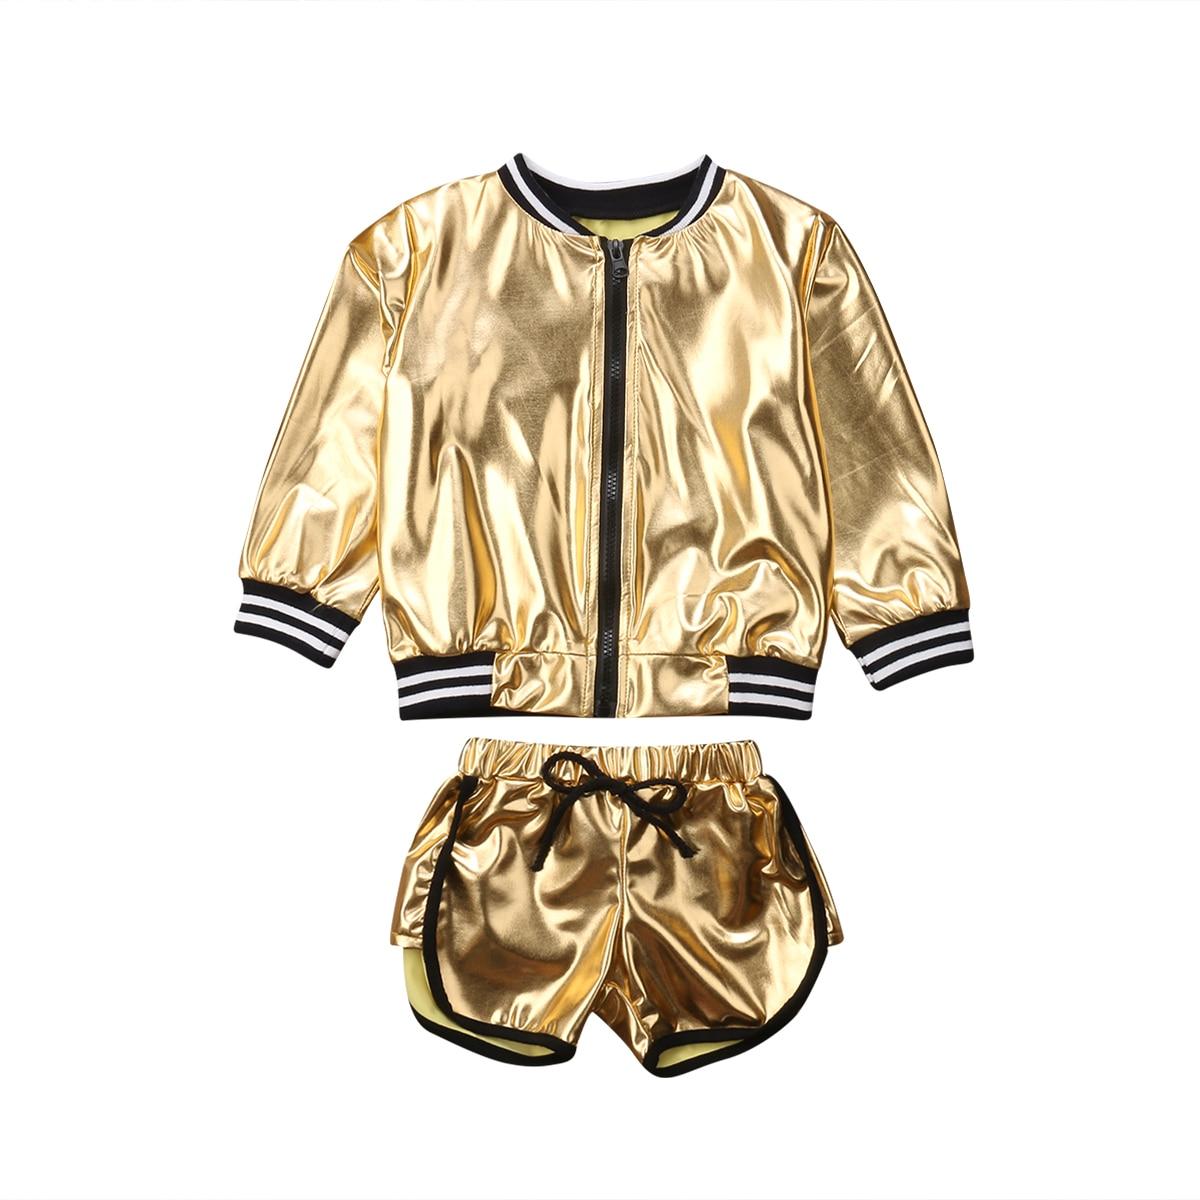 FOCUSNORM Fashion Toddler Kid Baby Girl Clothes Set Long Sleeve Shining Zip Top Coat Jacket+Shorts 2Pcs Outfits